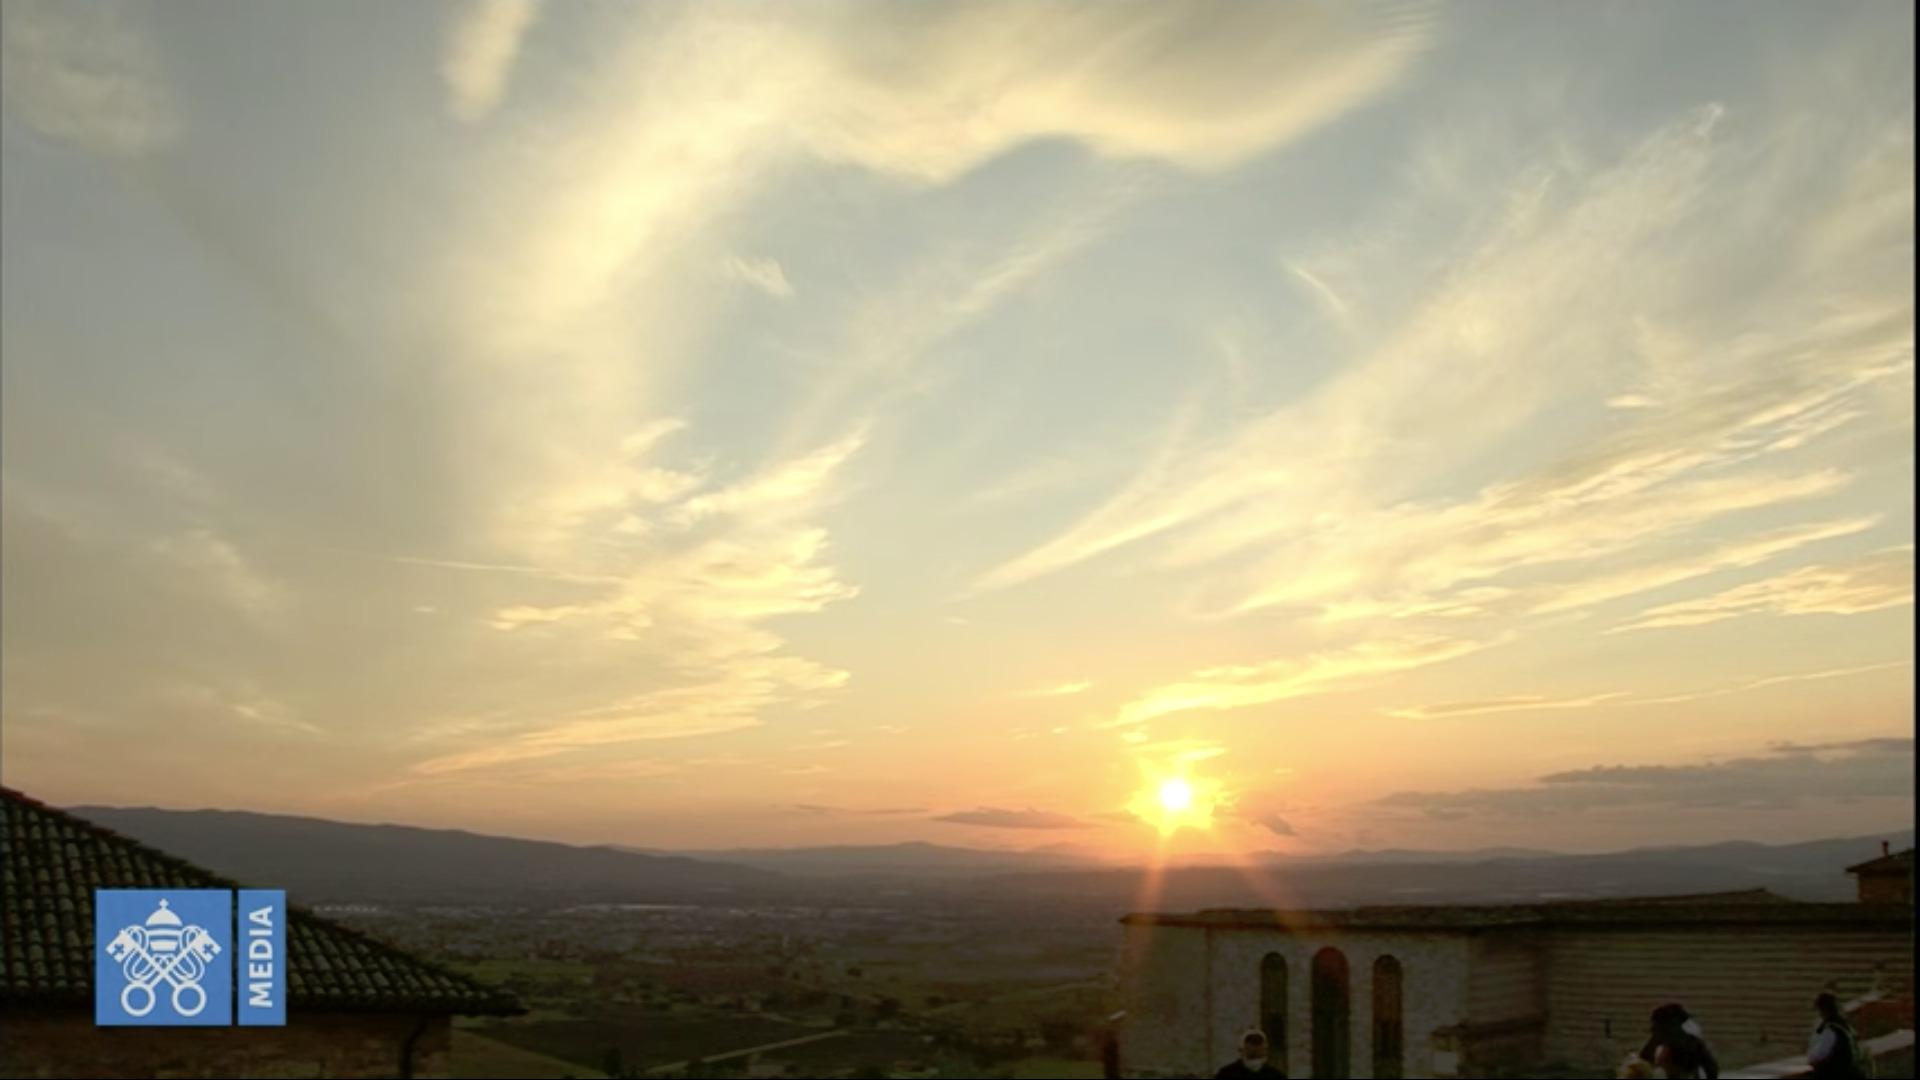 Le ciel d'Assise au terme de la béatification de Carlo Acutis, capture @ Vatican Media